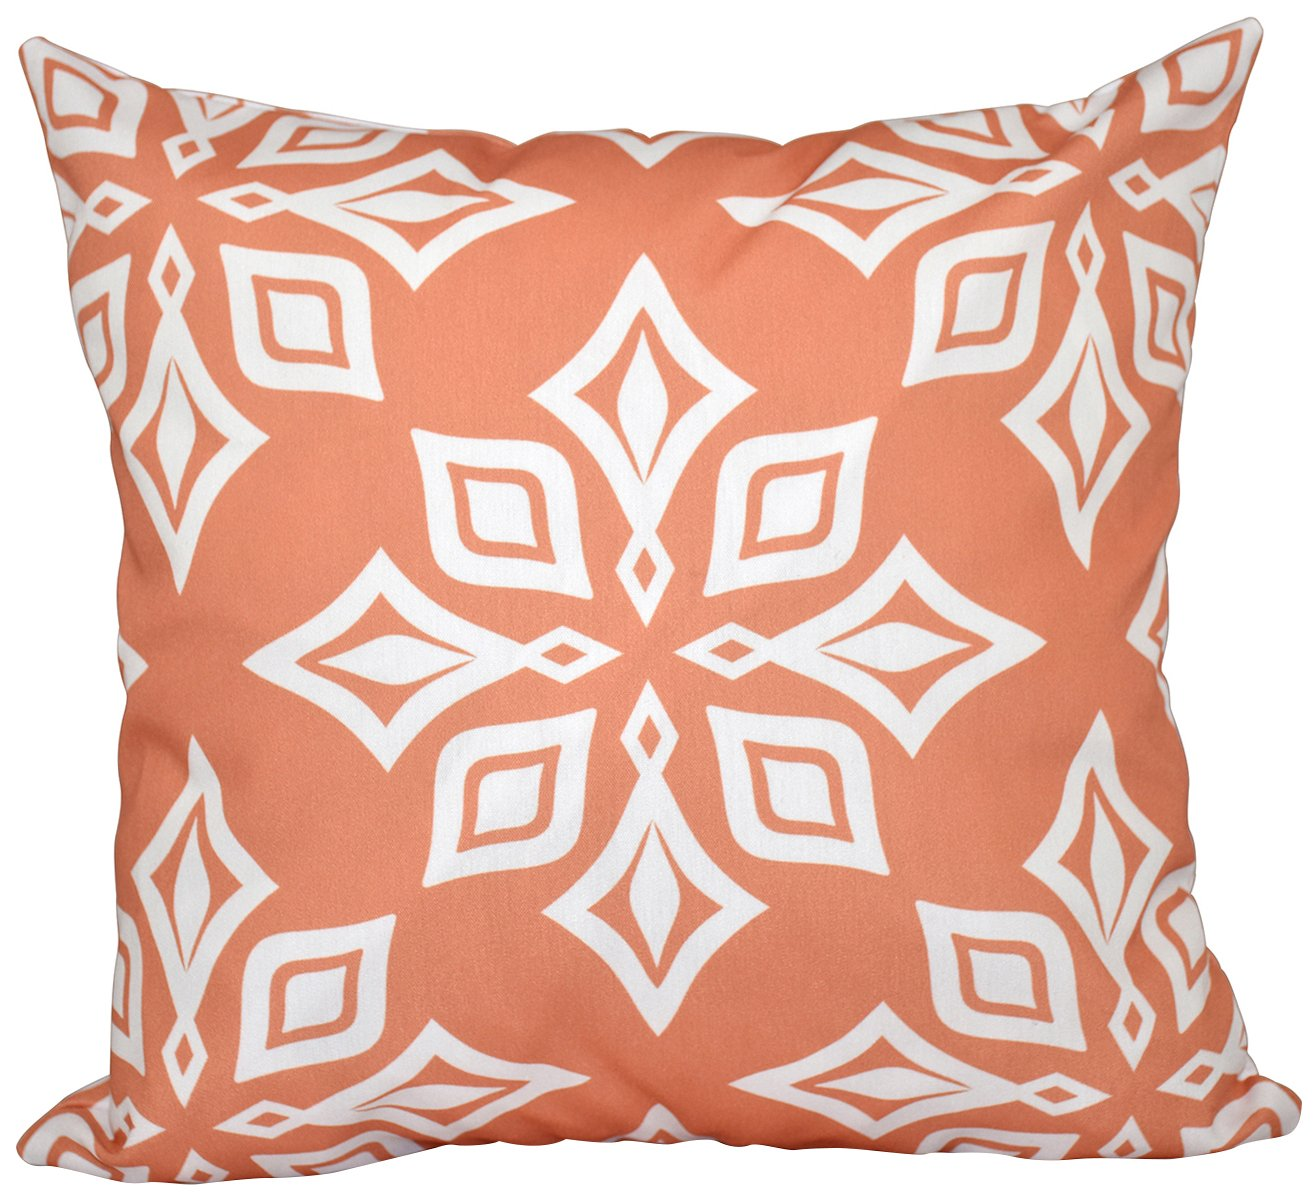 E by design O5PGN480OR10-18 Printed Outdoor Pillow